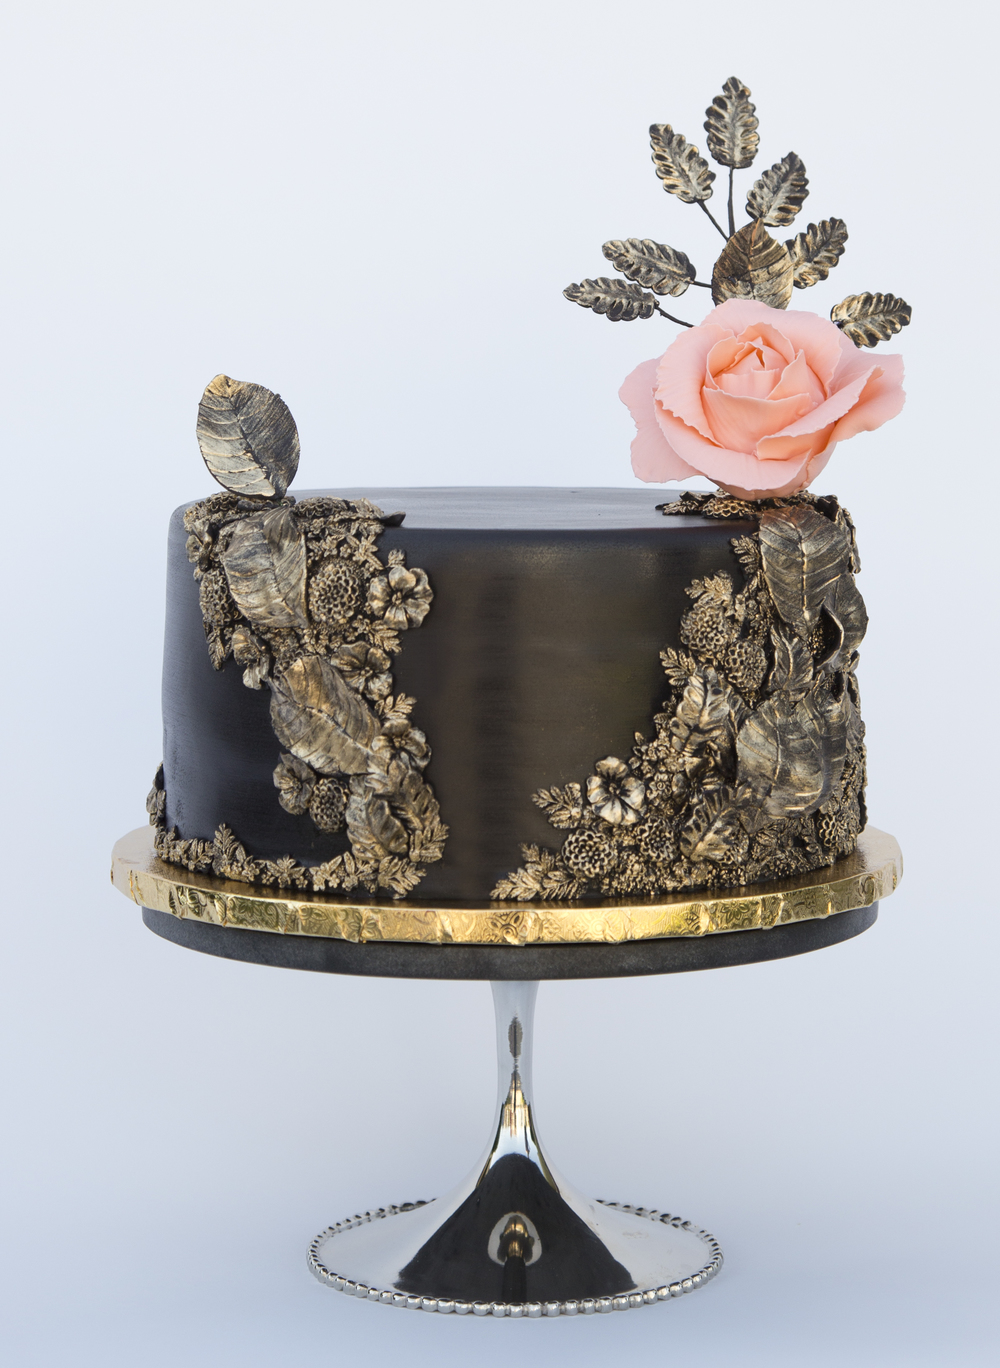 Three Little Cakes